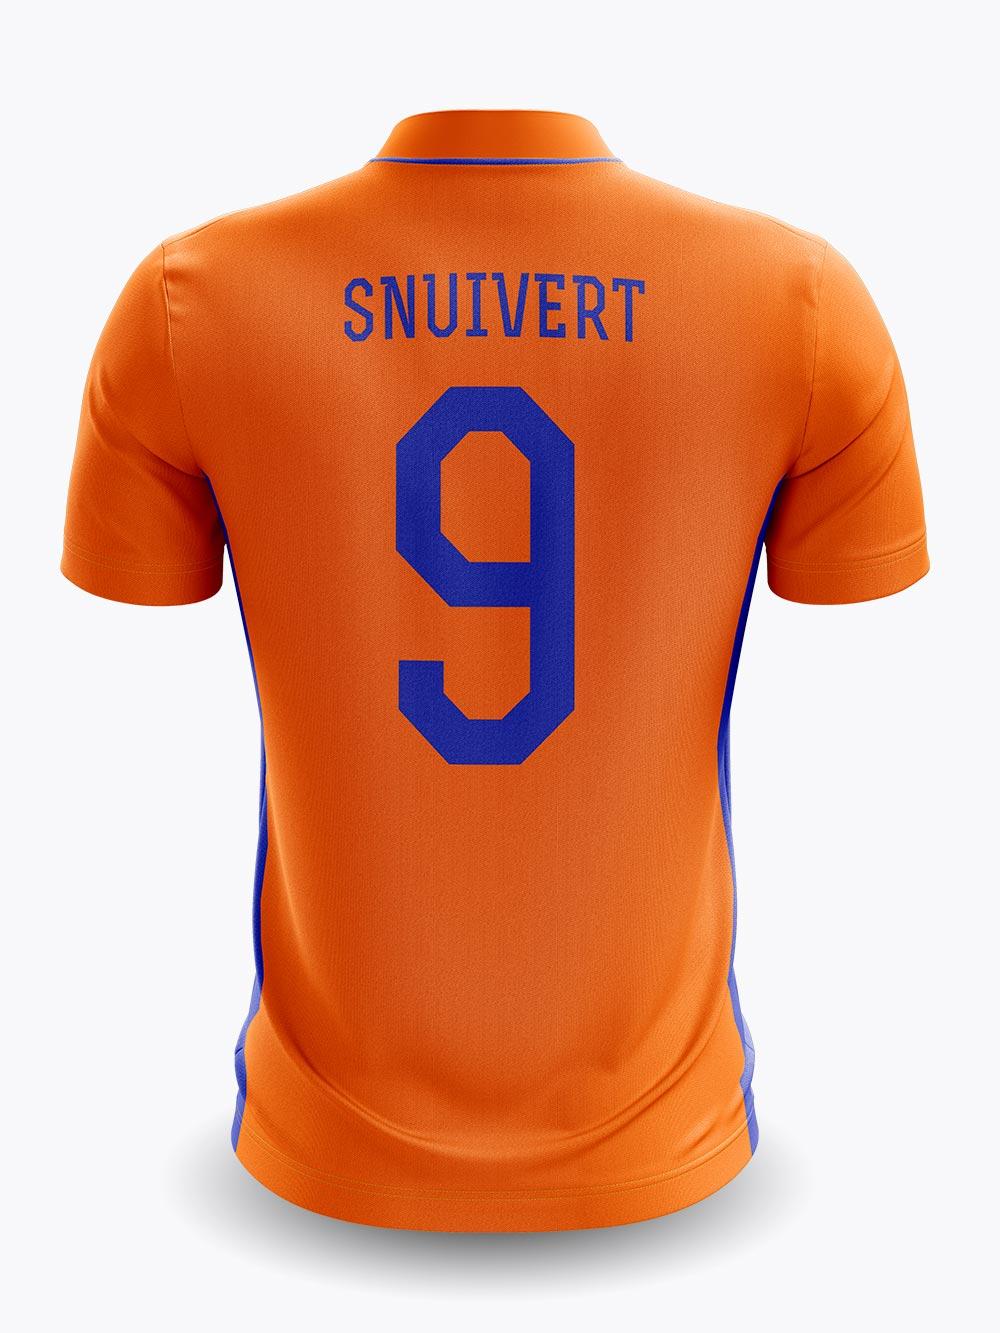 snuivert-shirt